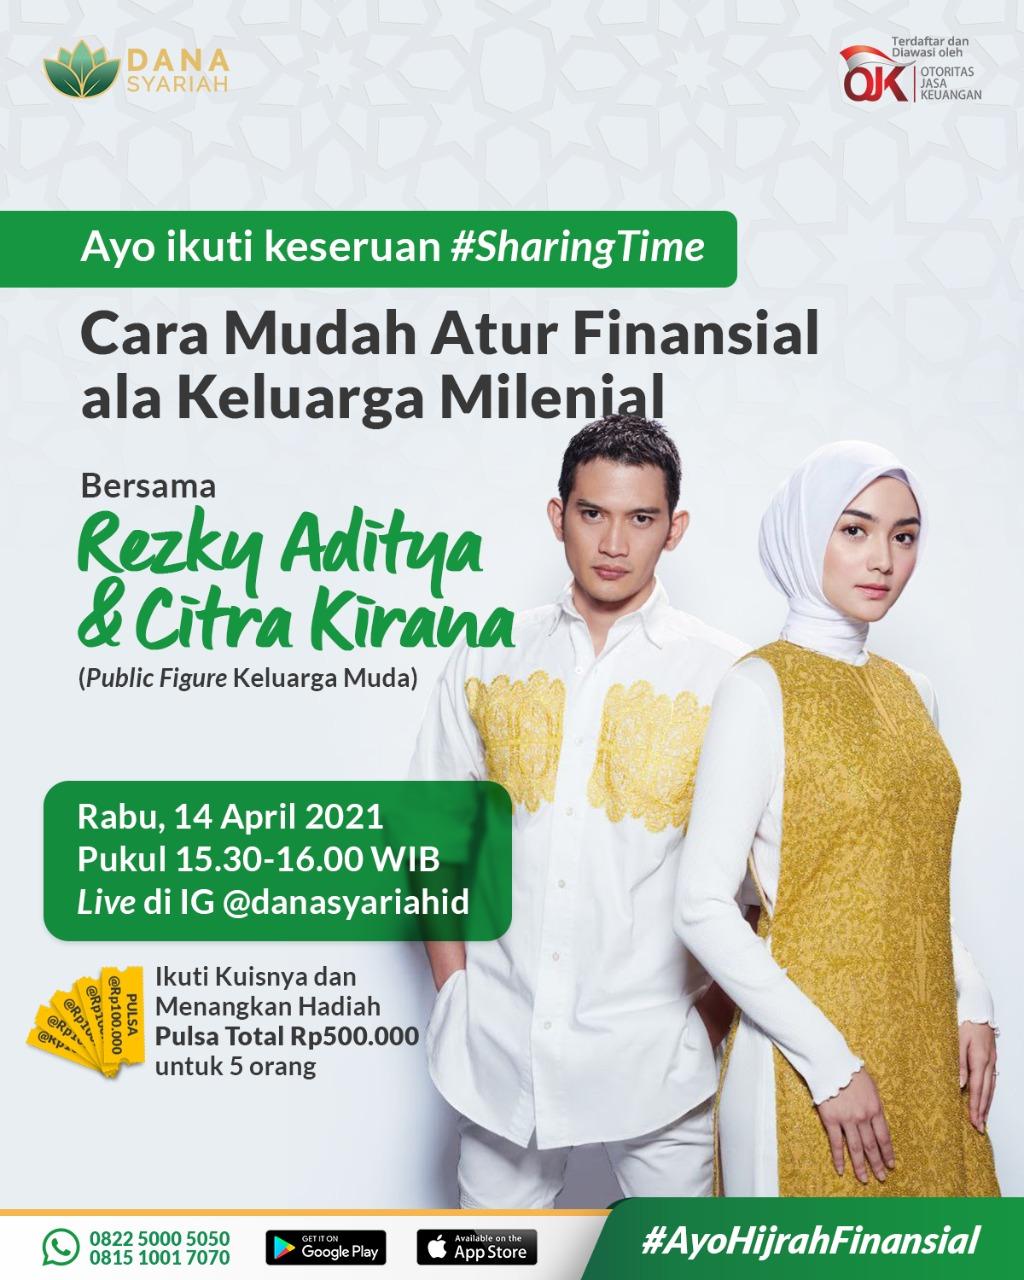 Dana Syariah Cara Mudah Atur Financial ala Keluarga Milenial Bersama Ka Rezky & Ka Ciki